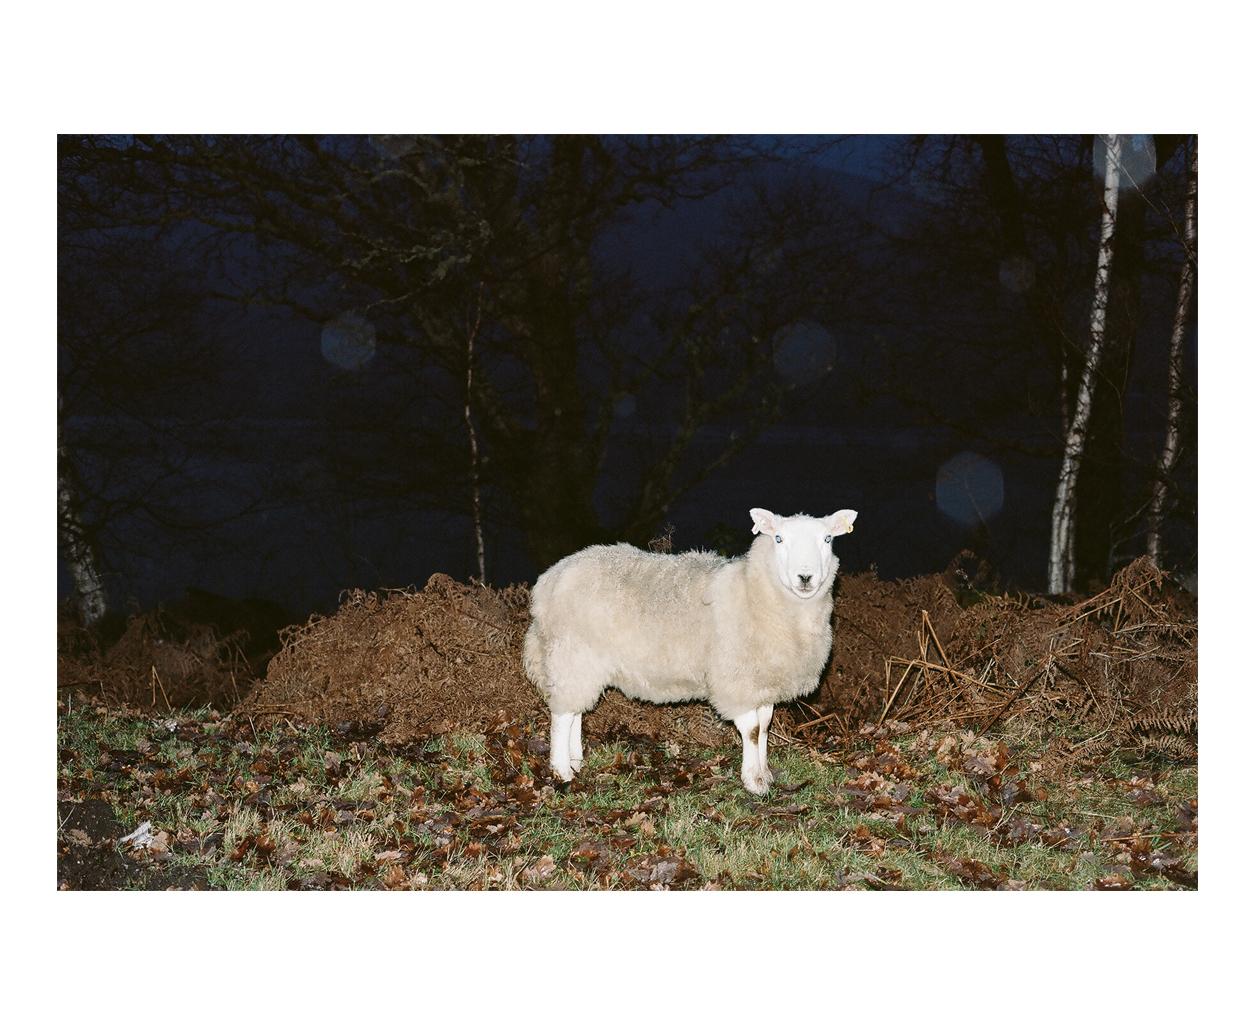 Ghost sheep, Loch Eil, Scotland.